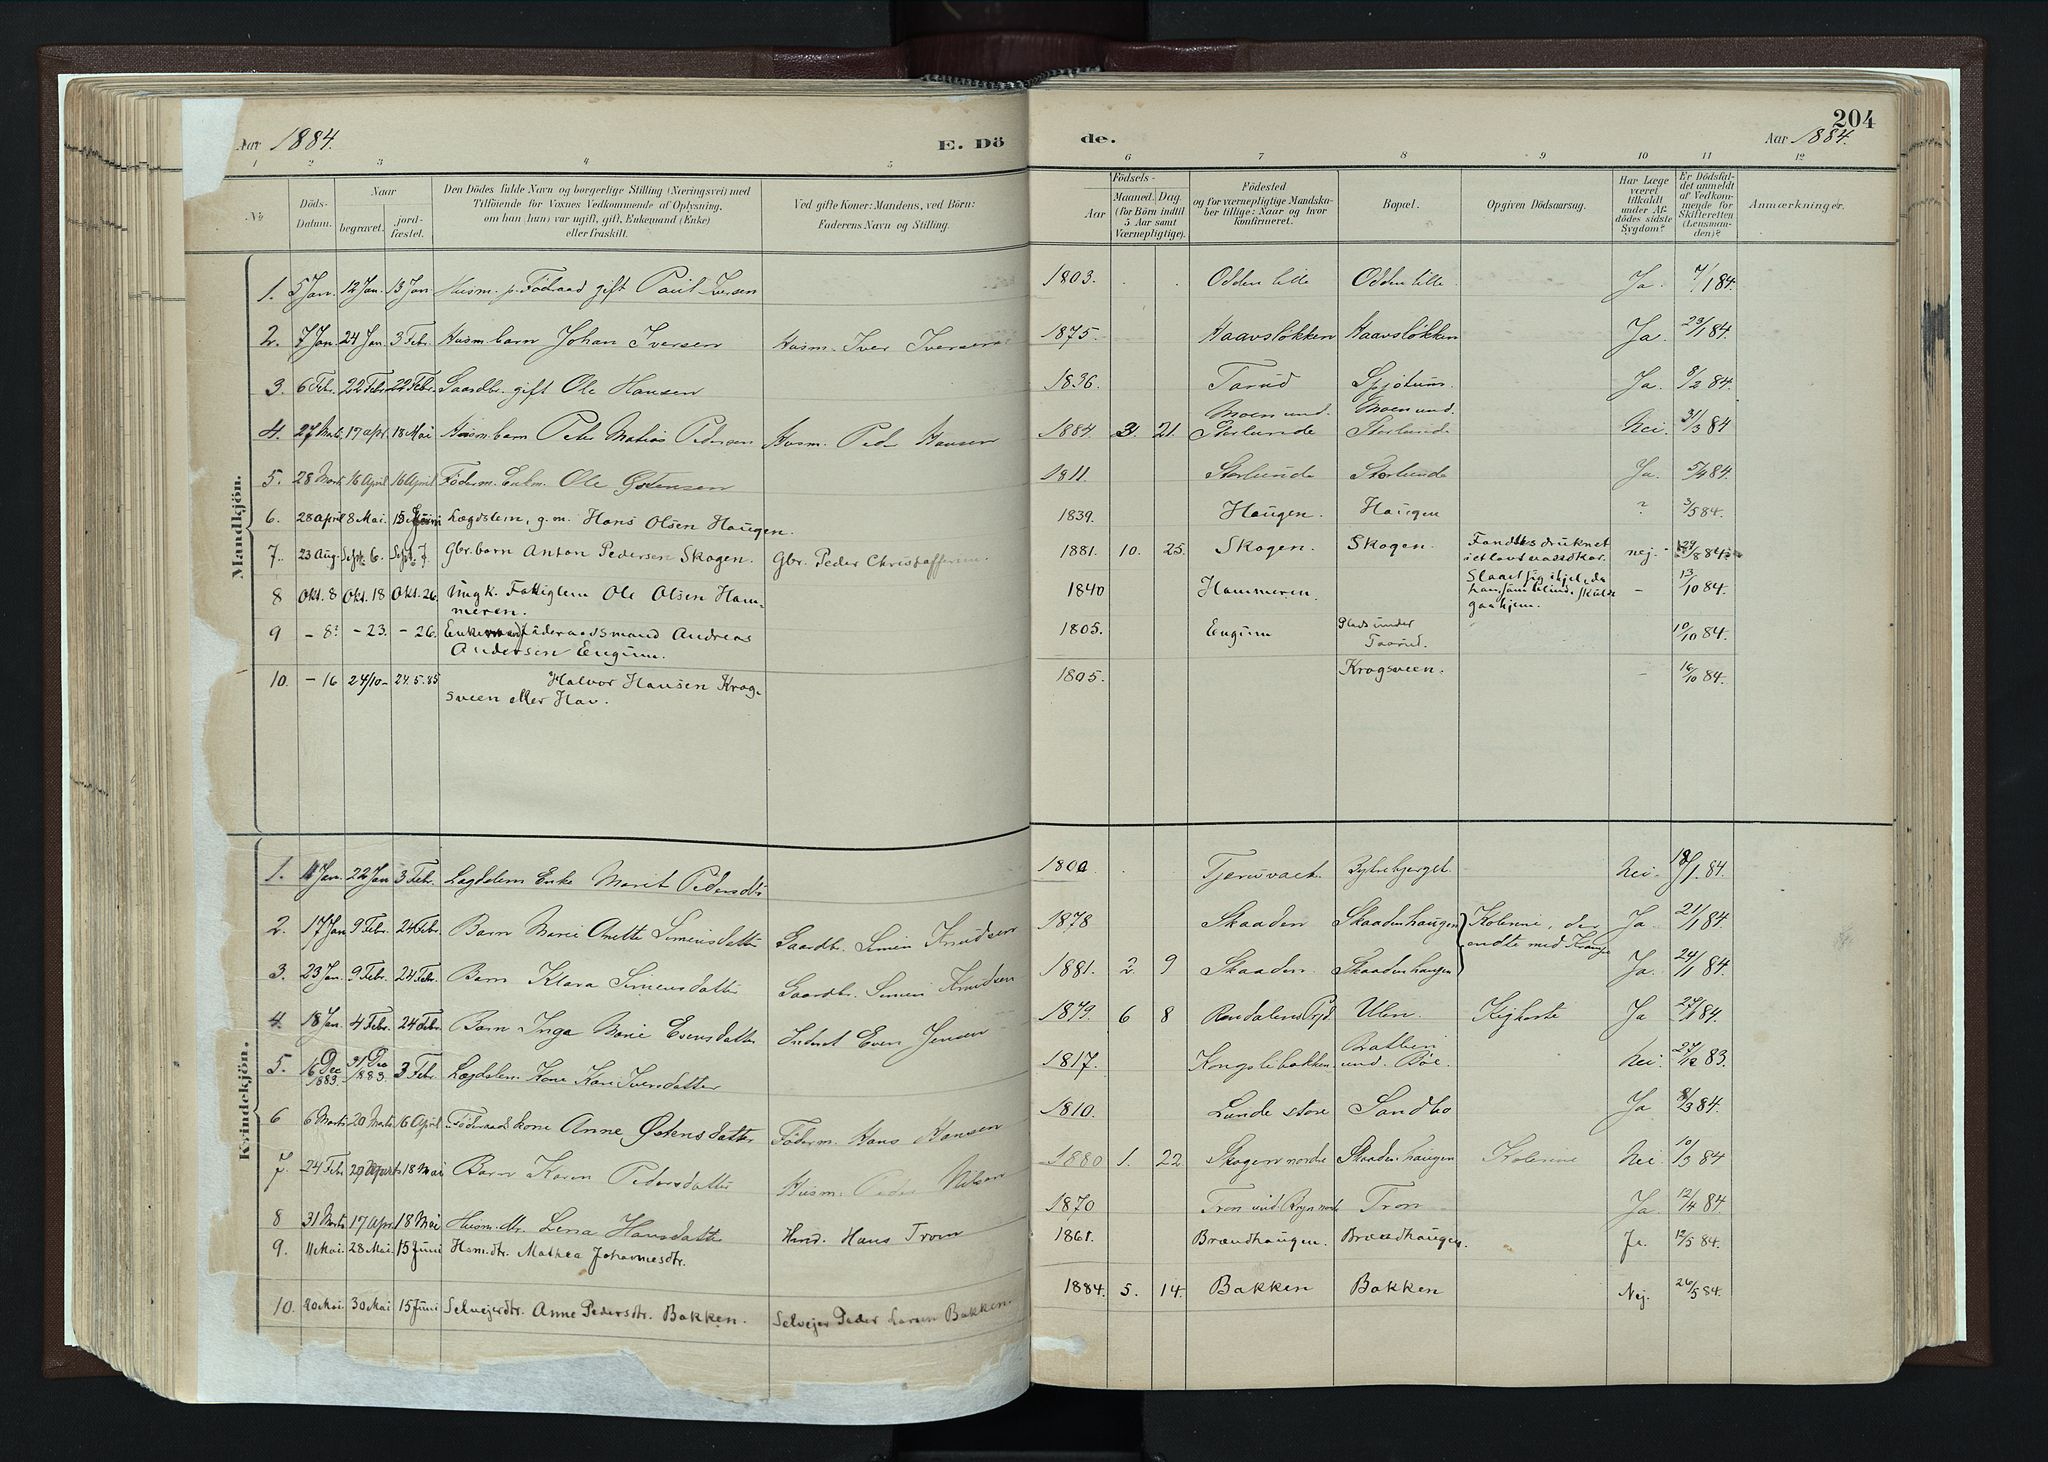 SAH, Nord-Fron prestekontor, Ministerialbok nr. 4, 1884-1914, s. 204